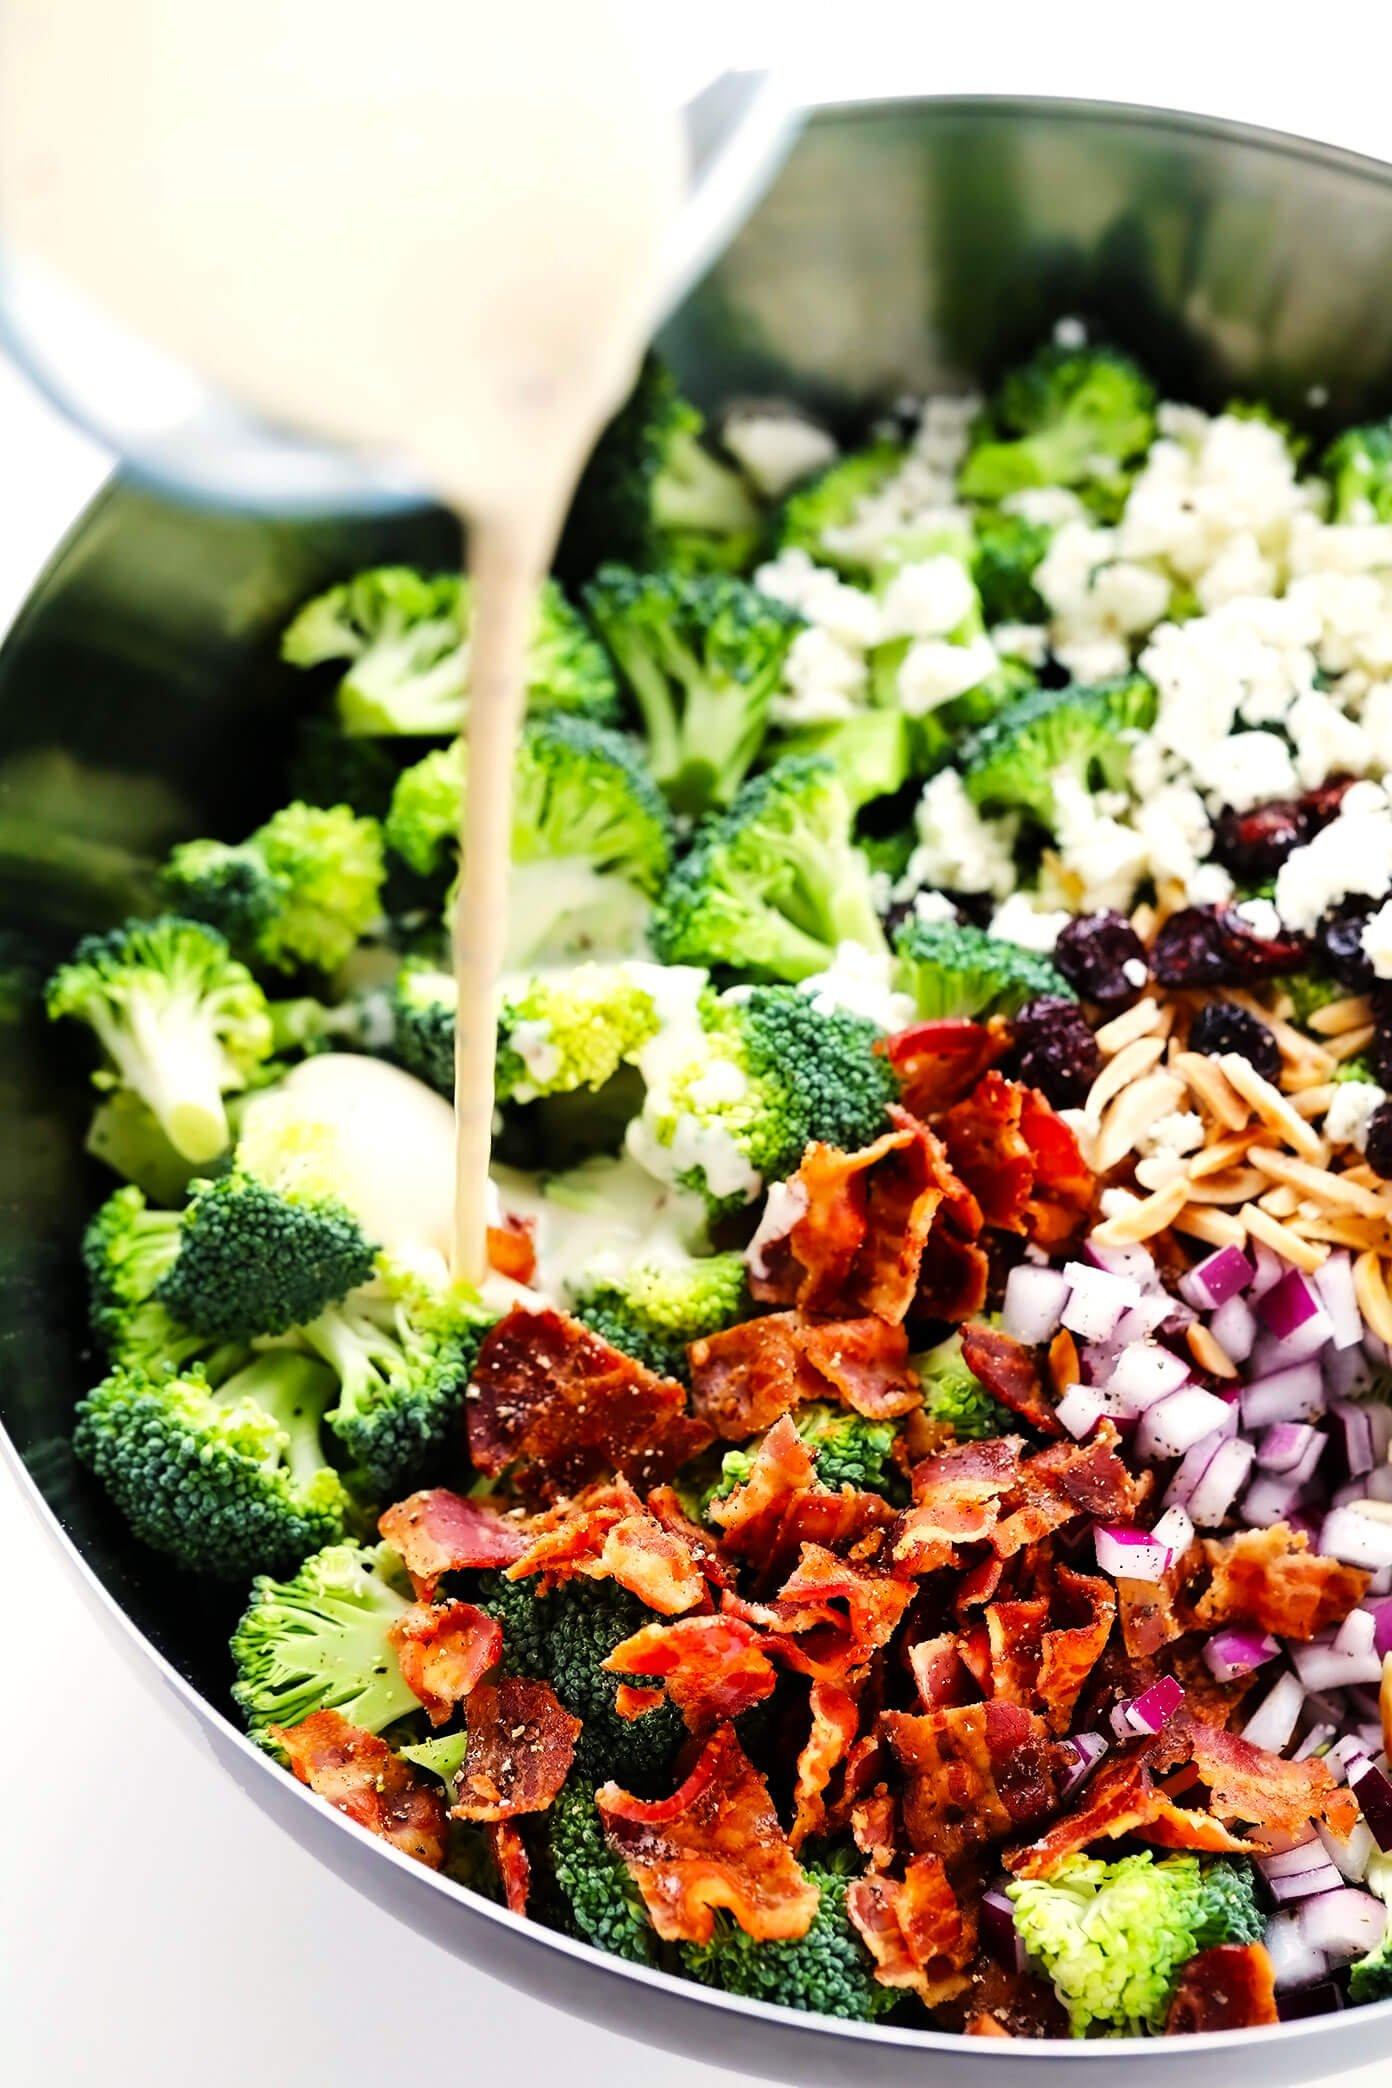 Pouring creamy dressing into broccoli salad